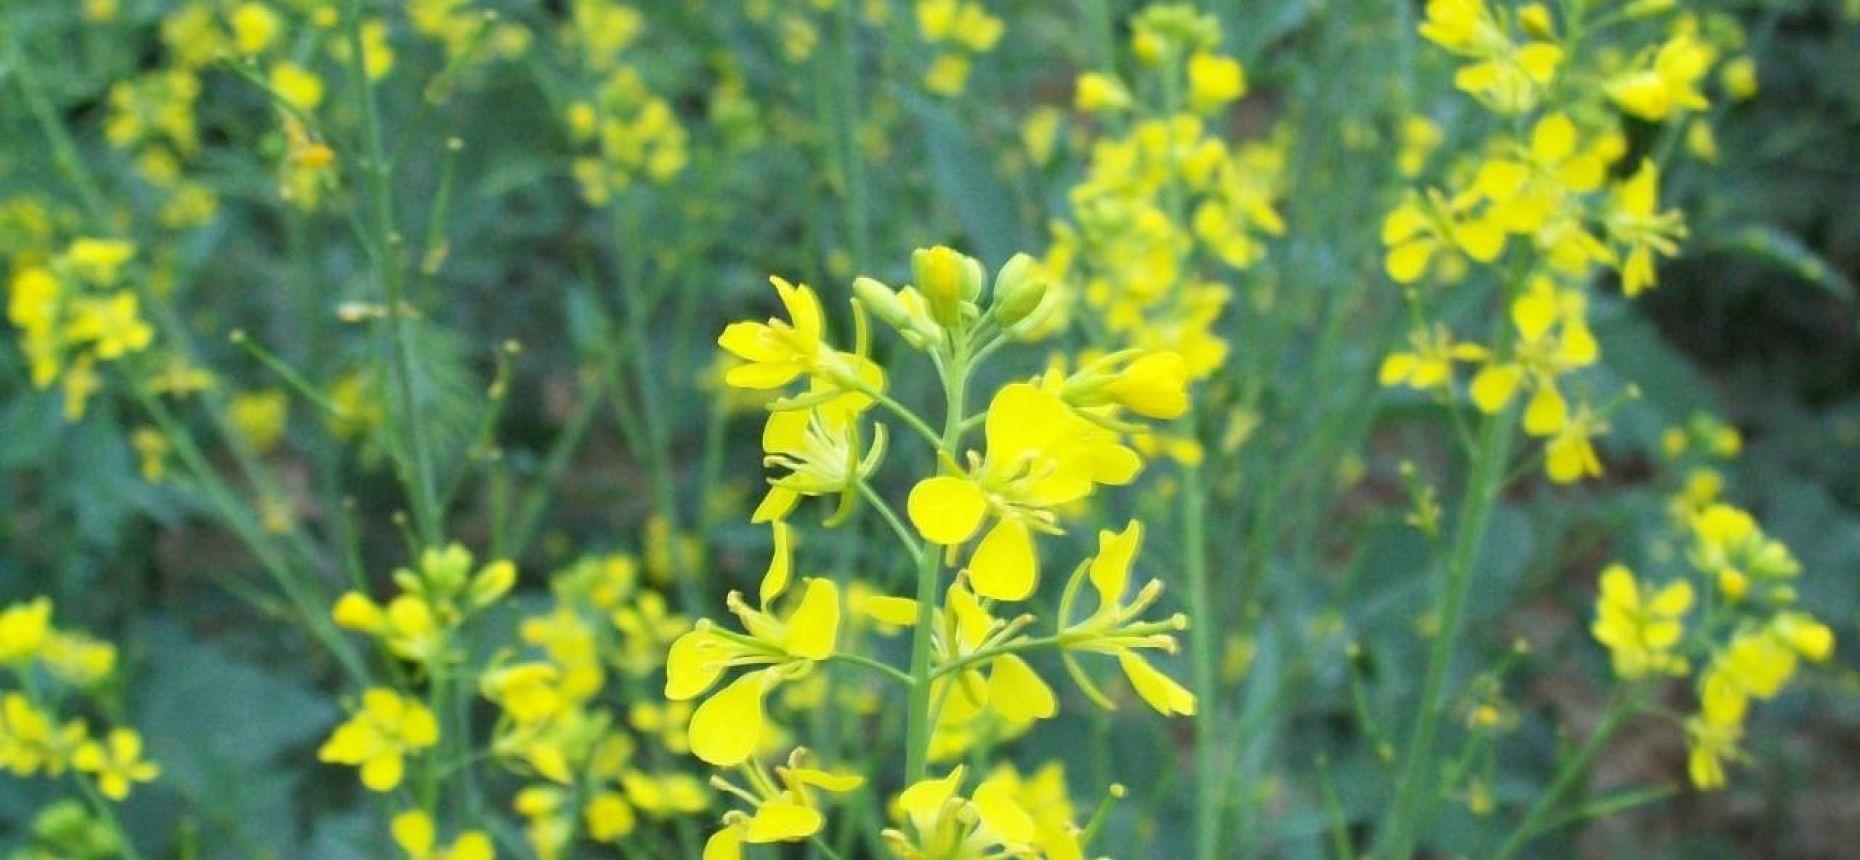 Brassica juncea (L.) Czern. - Горчица сарептская